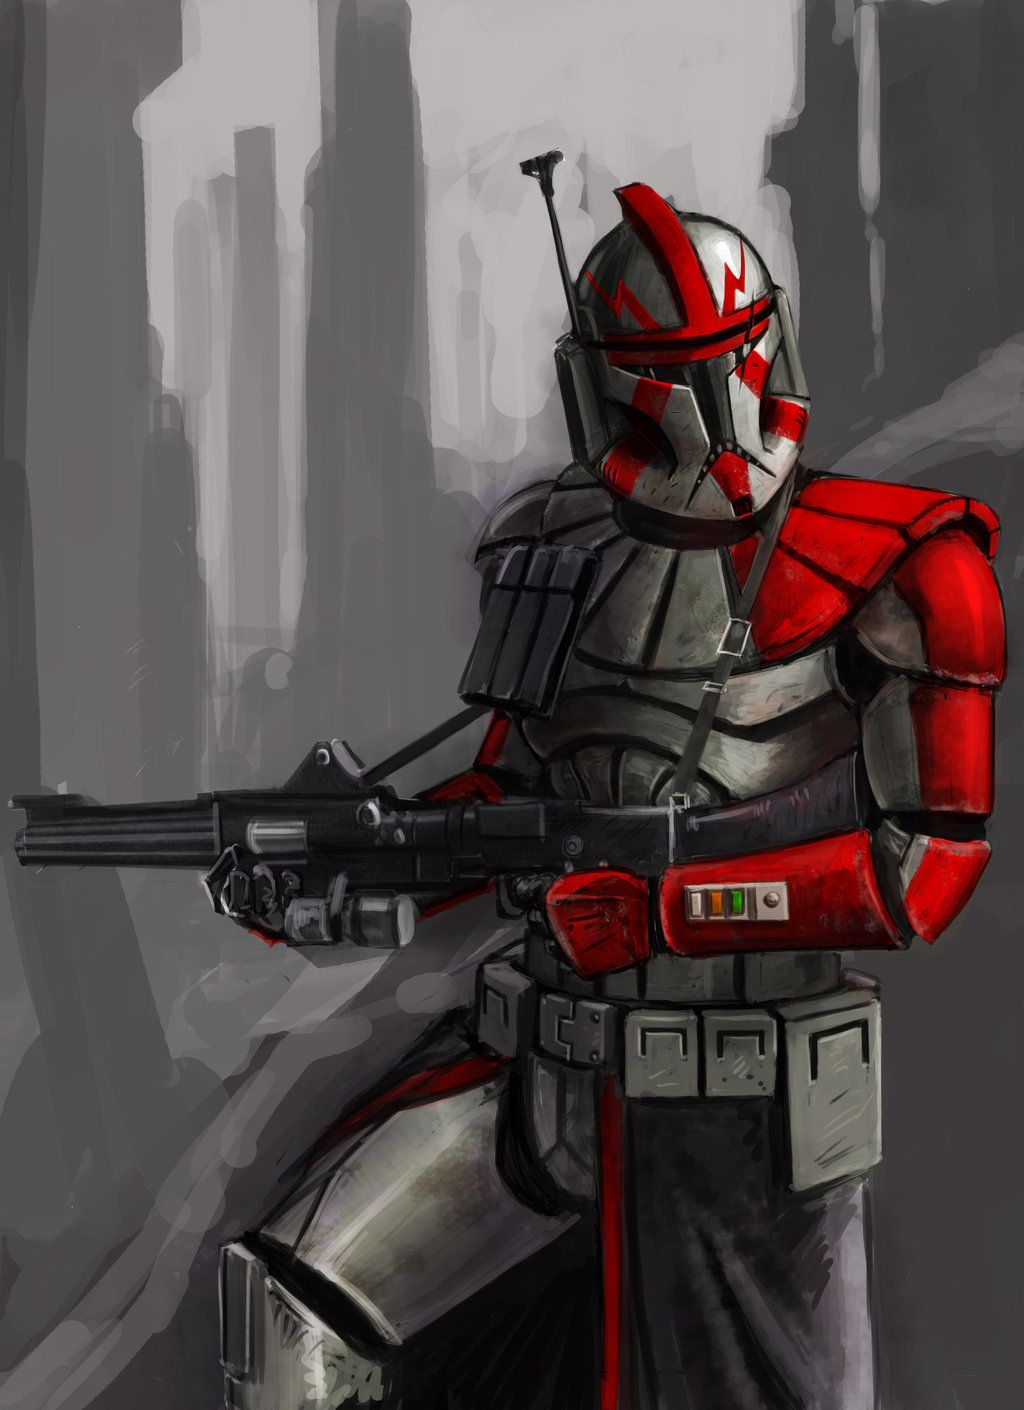 Clone Trooper By Andgil On Deviantart Star Wars Drawings Star Wars Images Star Wars Artwork